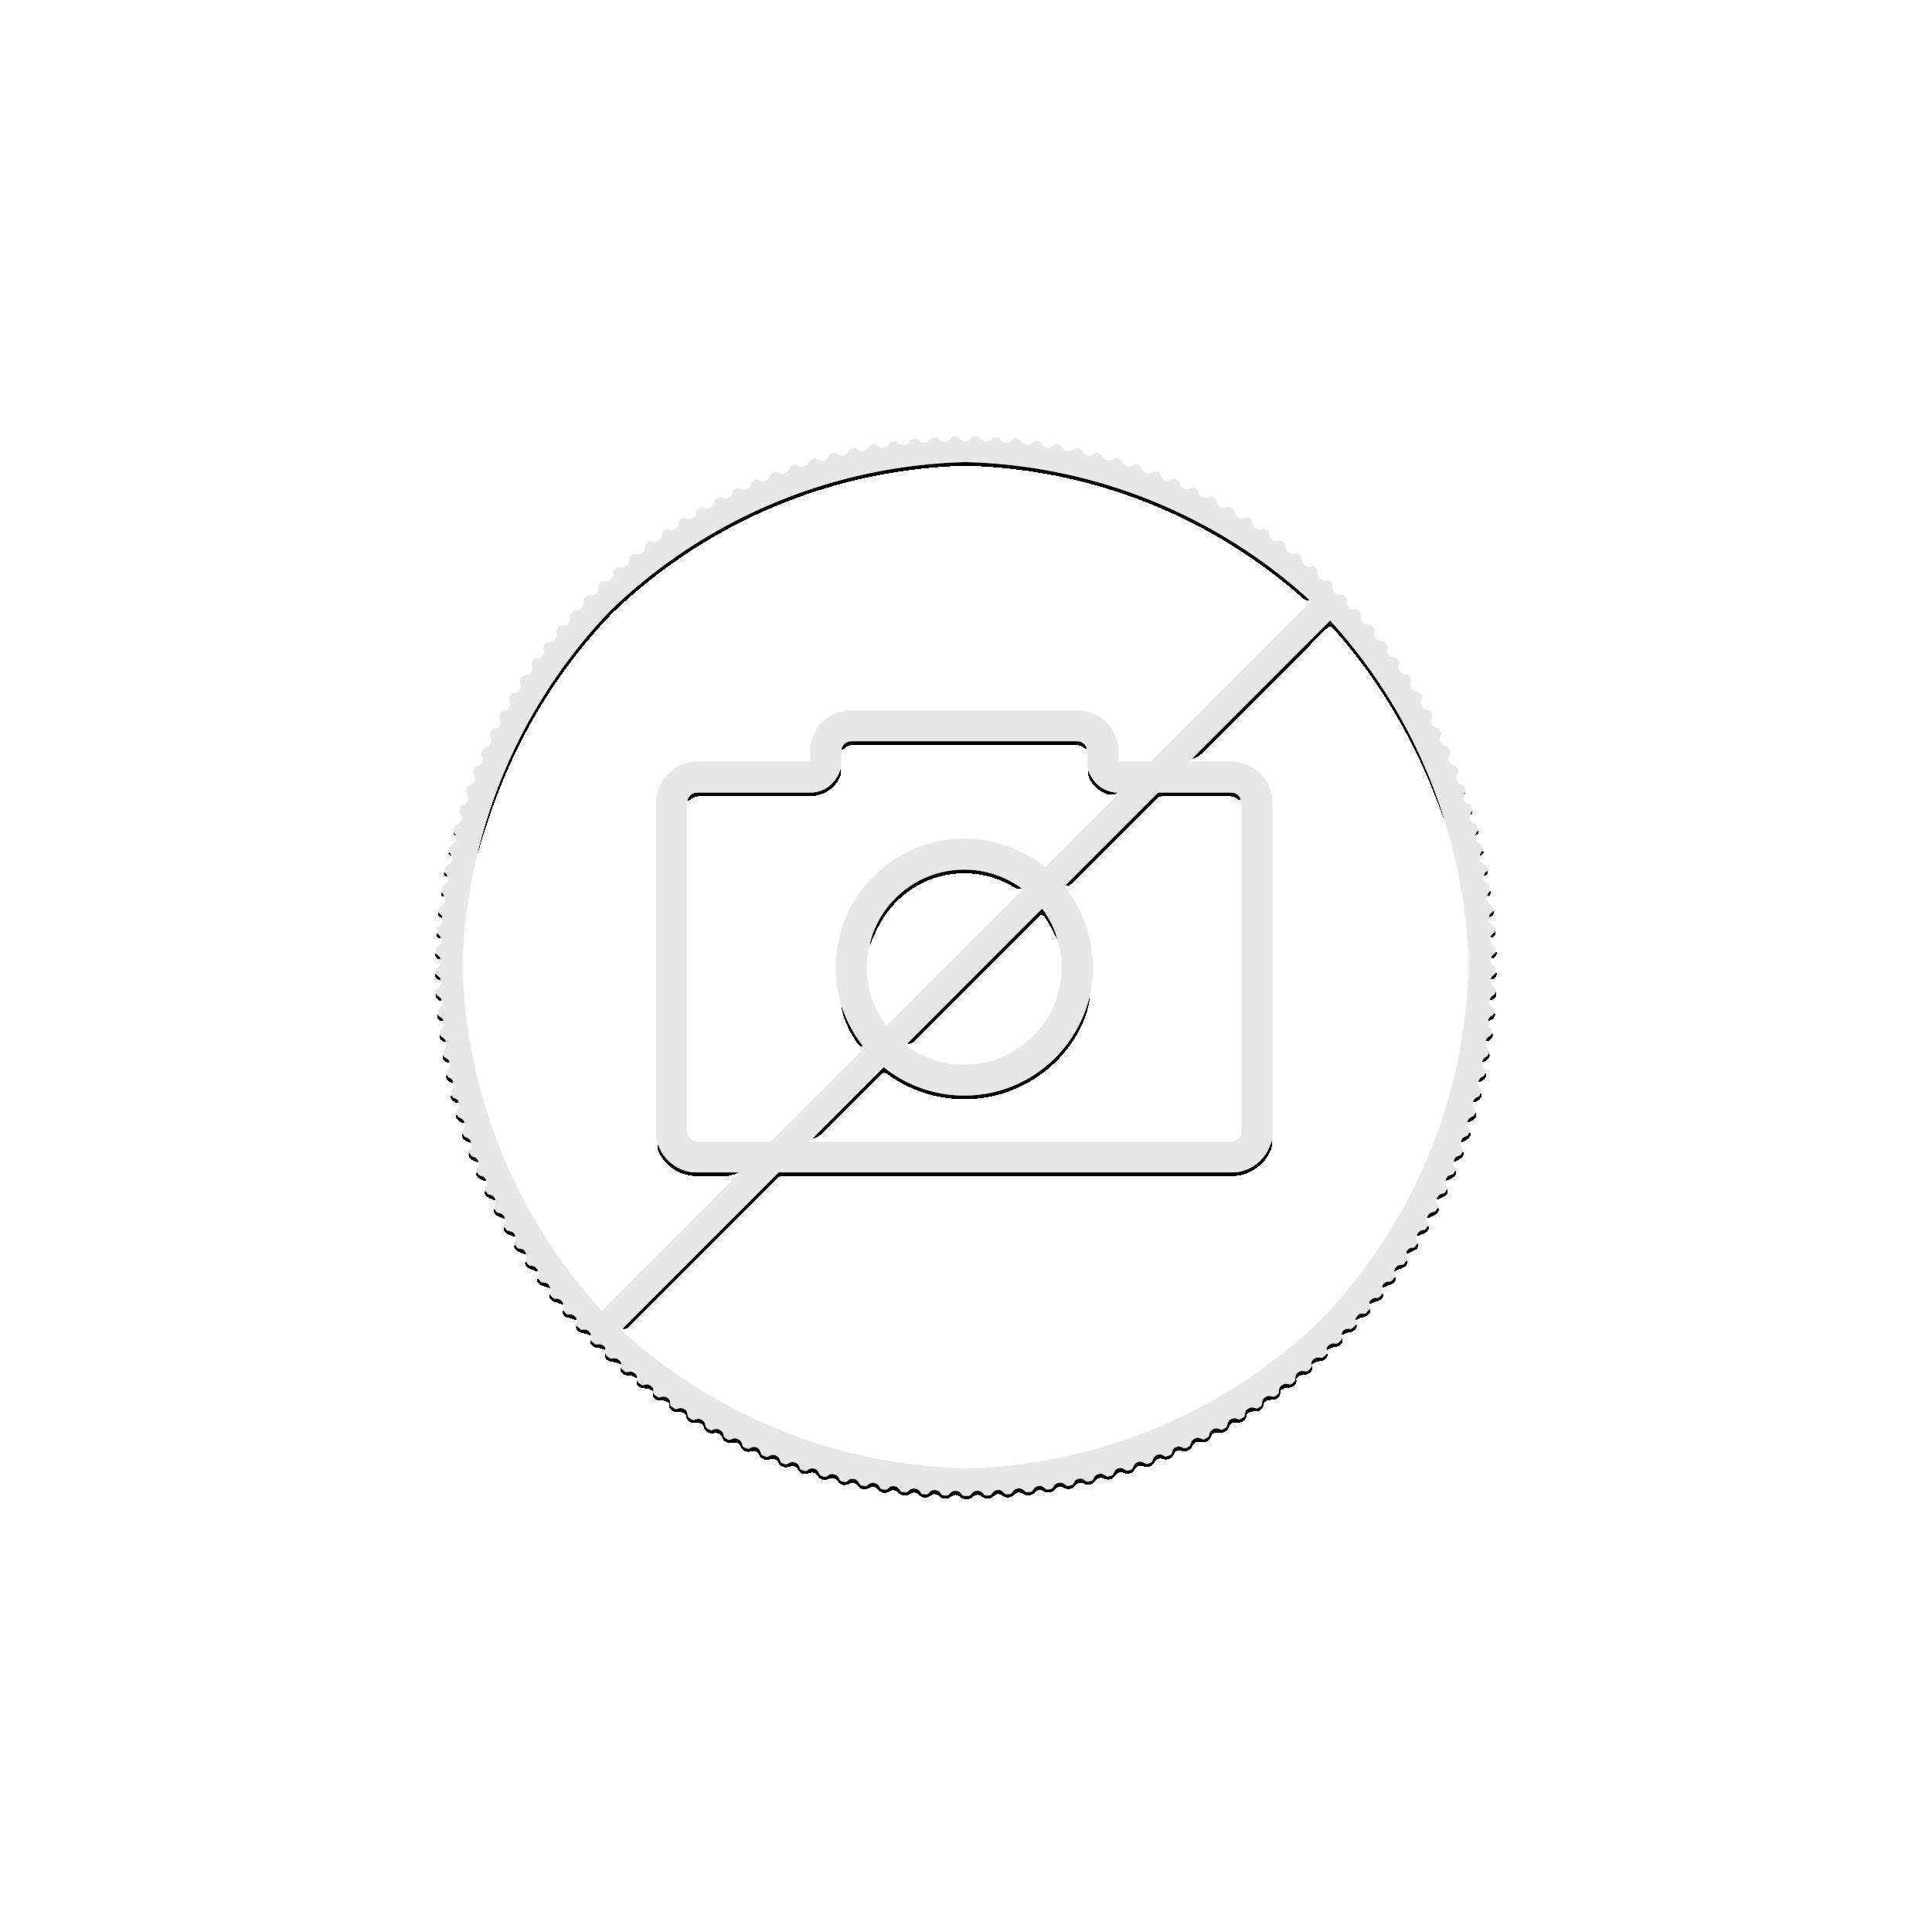 1 troy ounce gouden munt Britannia 2021 - veiligheidsfeatures